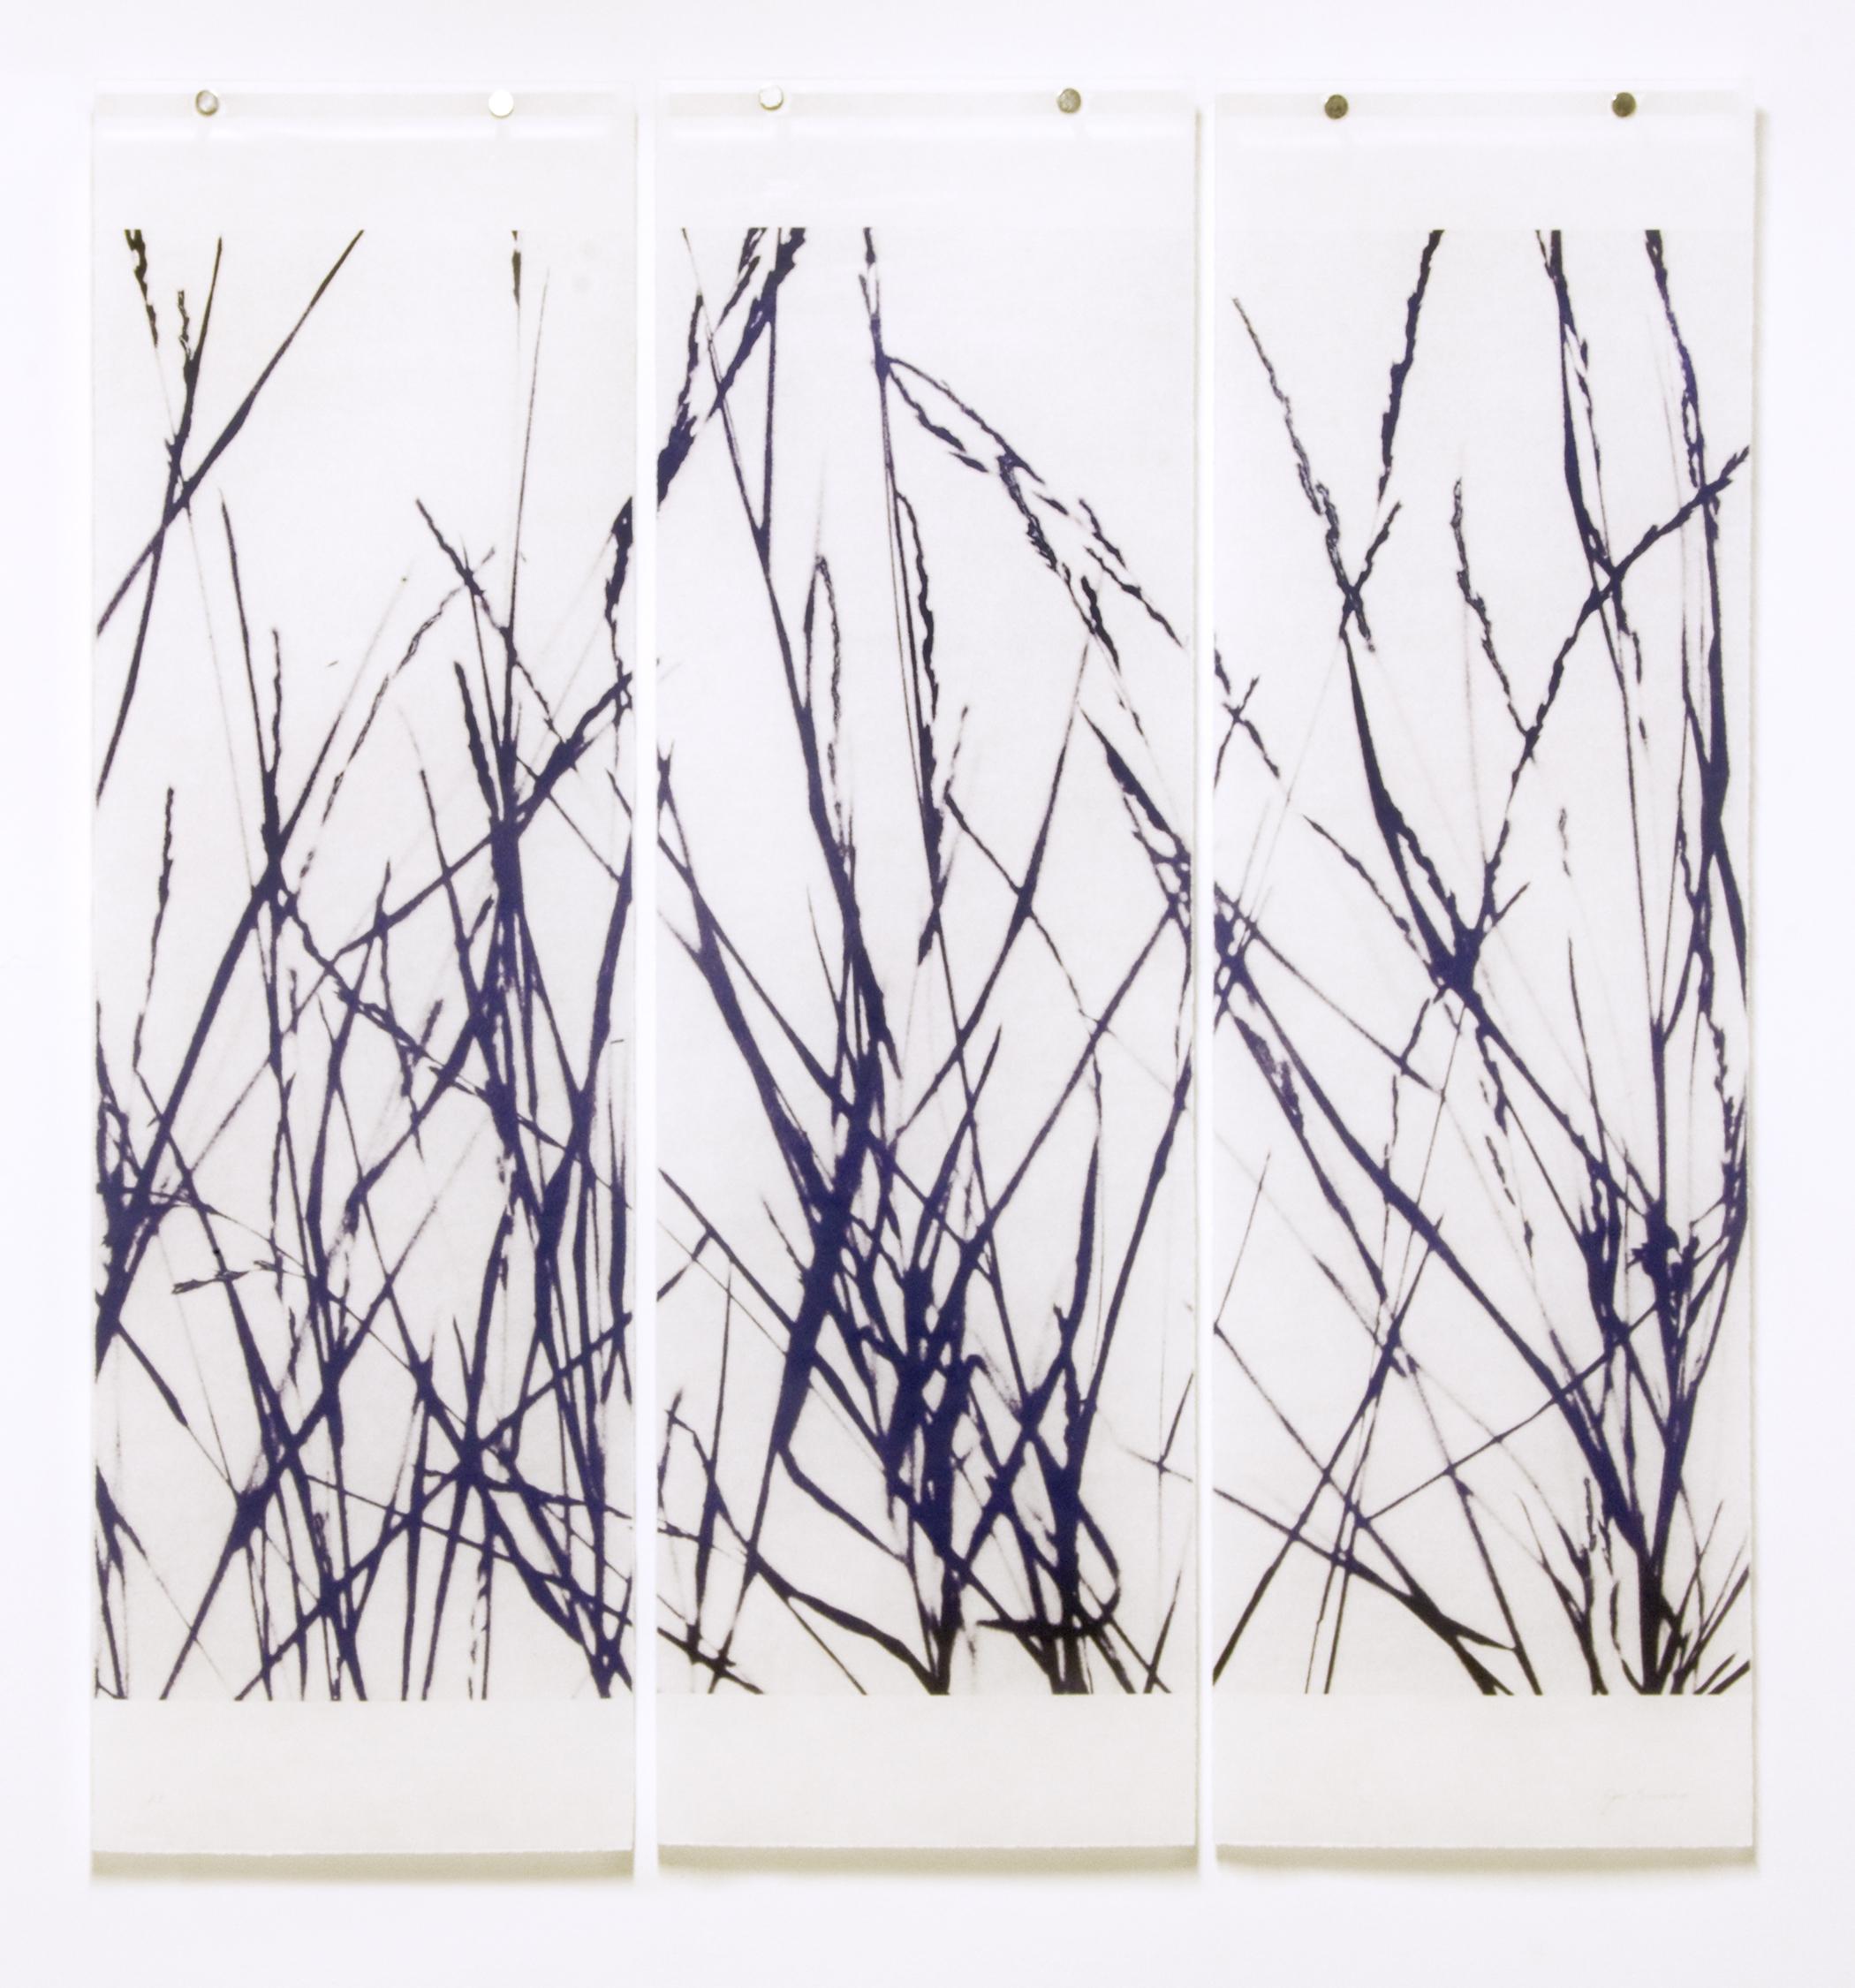 Tall Grasses (Reversed)